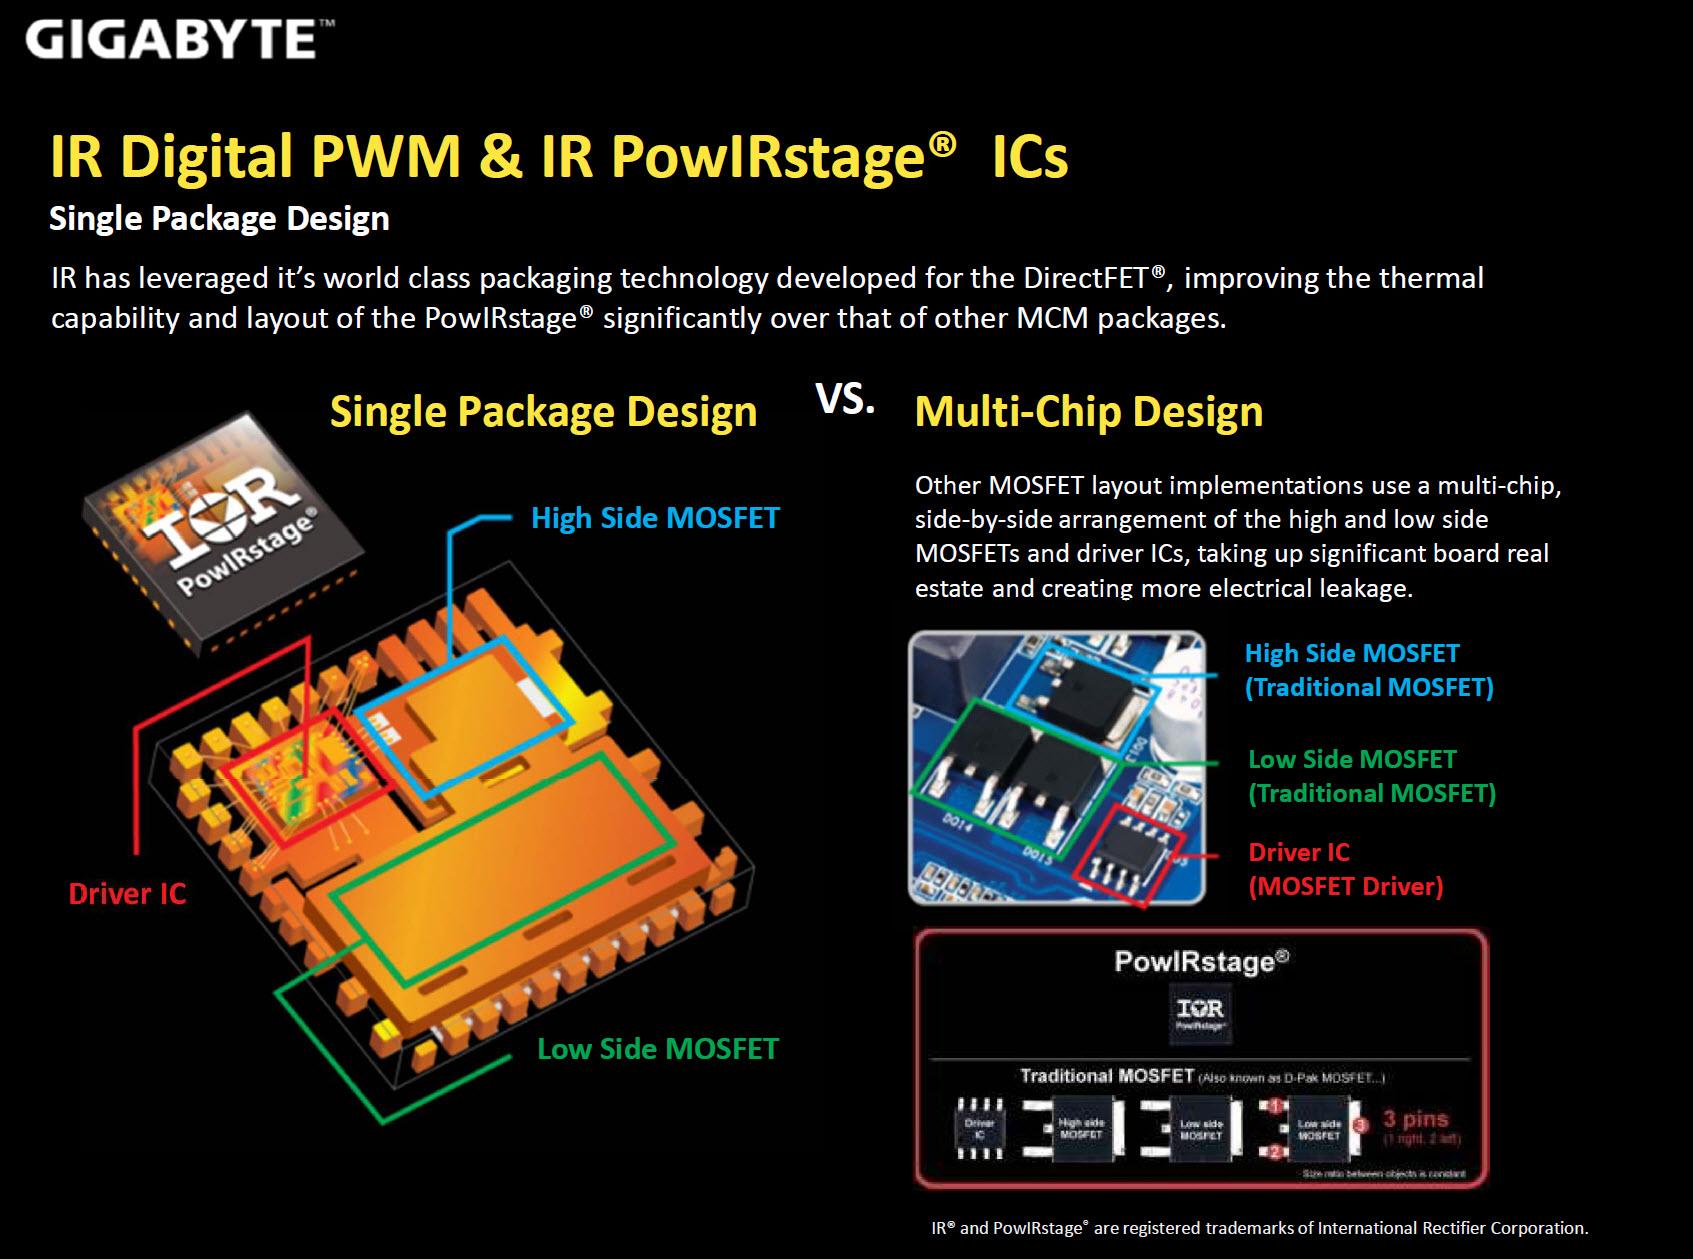 gigabyte-x99-ud7-wifi_ir-digital-pwm